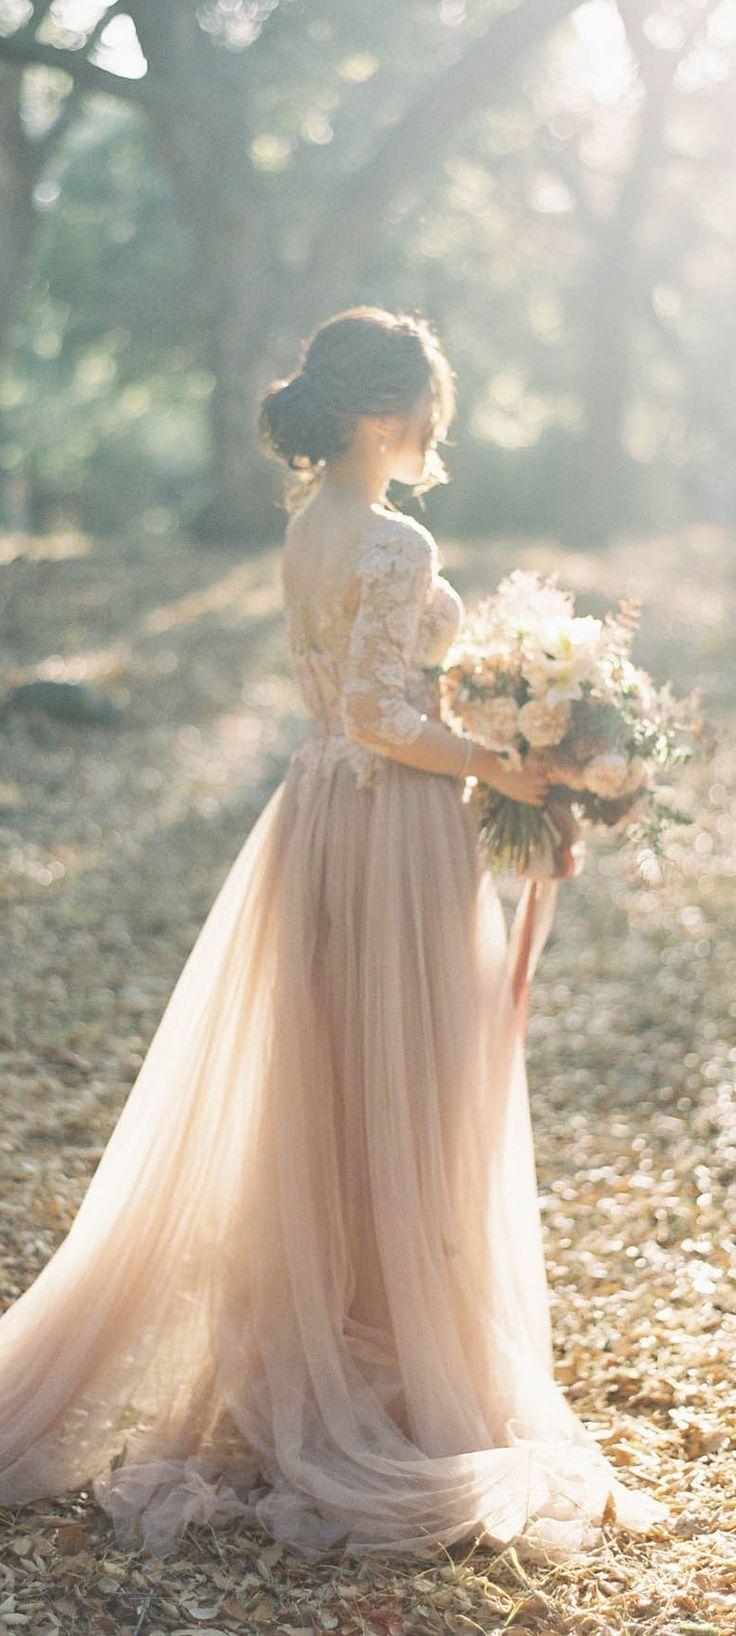 This beige wedding dress is magical Wedding dresses